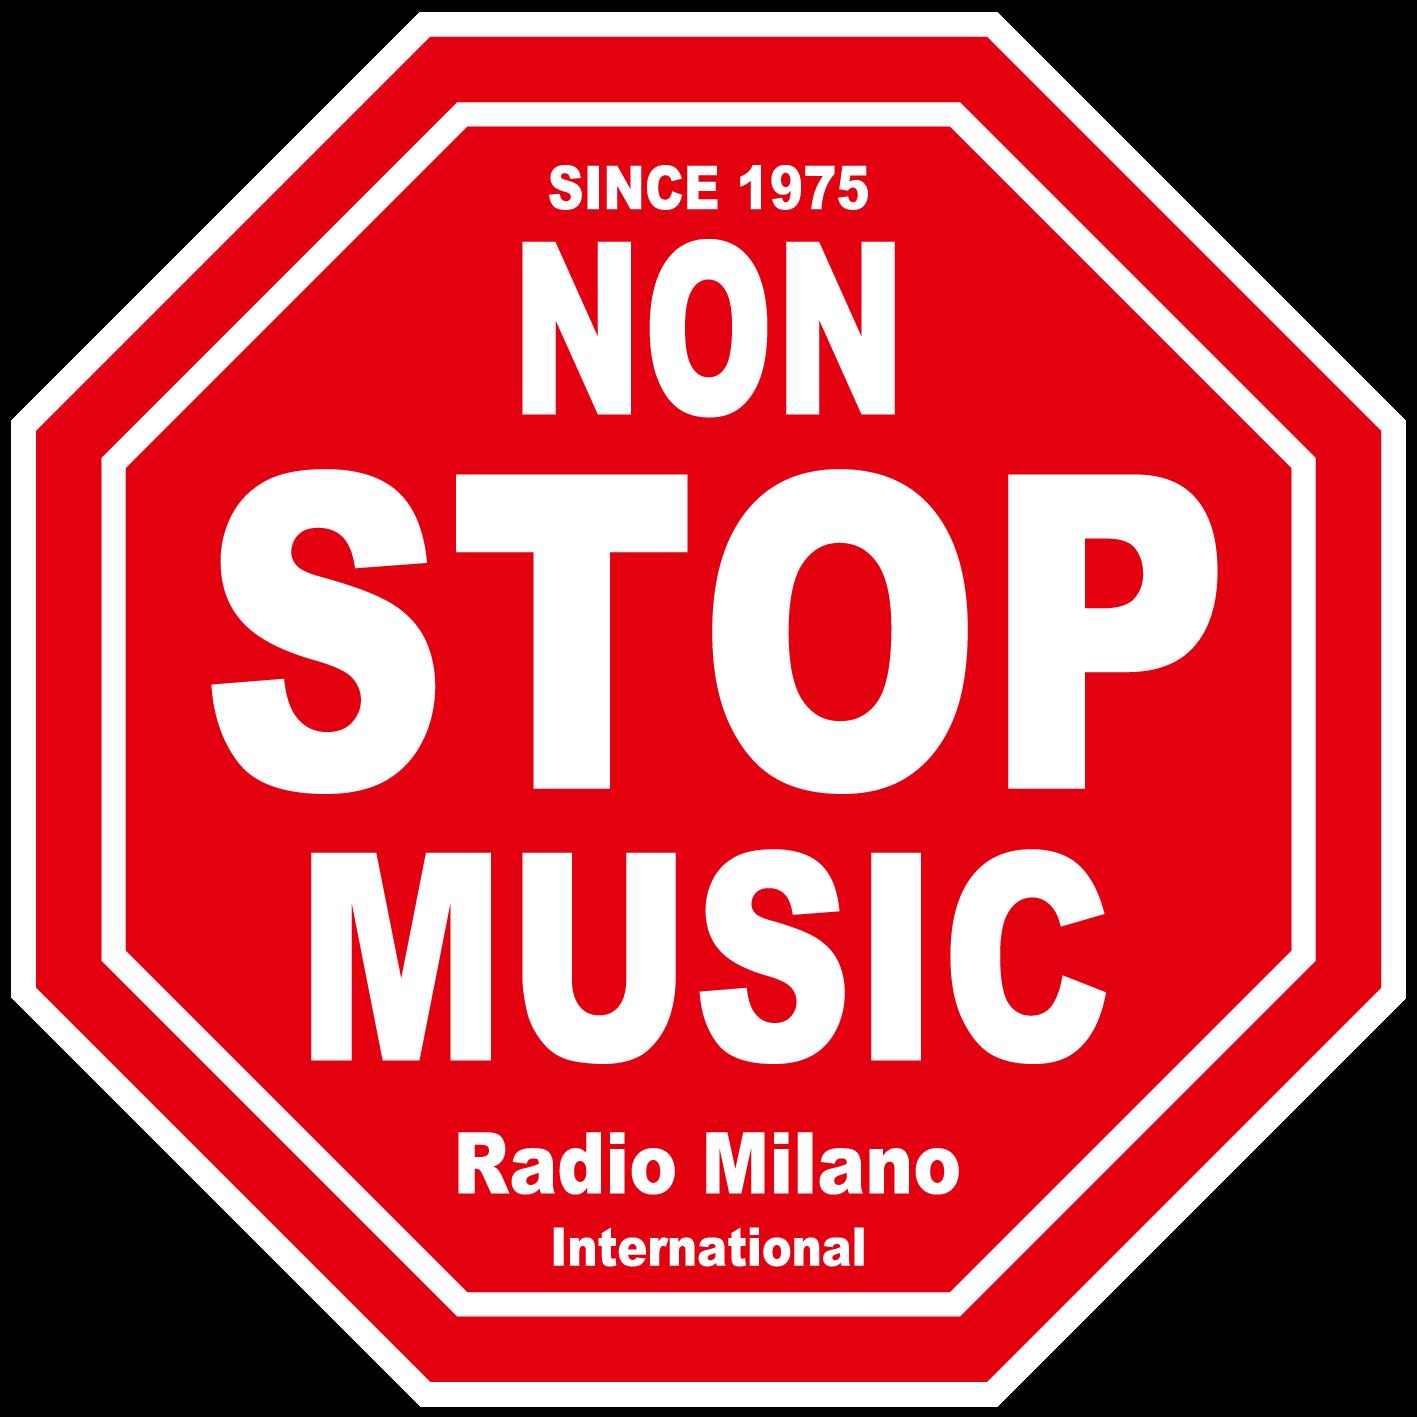 Radio Milano International